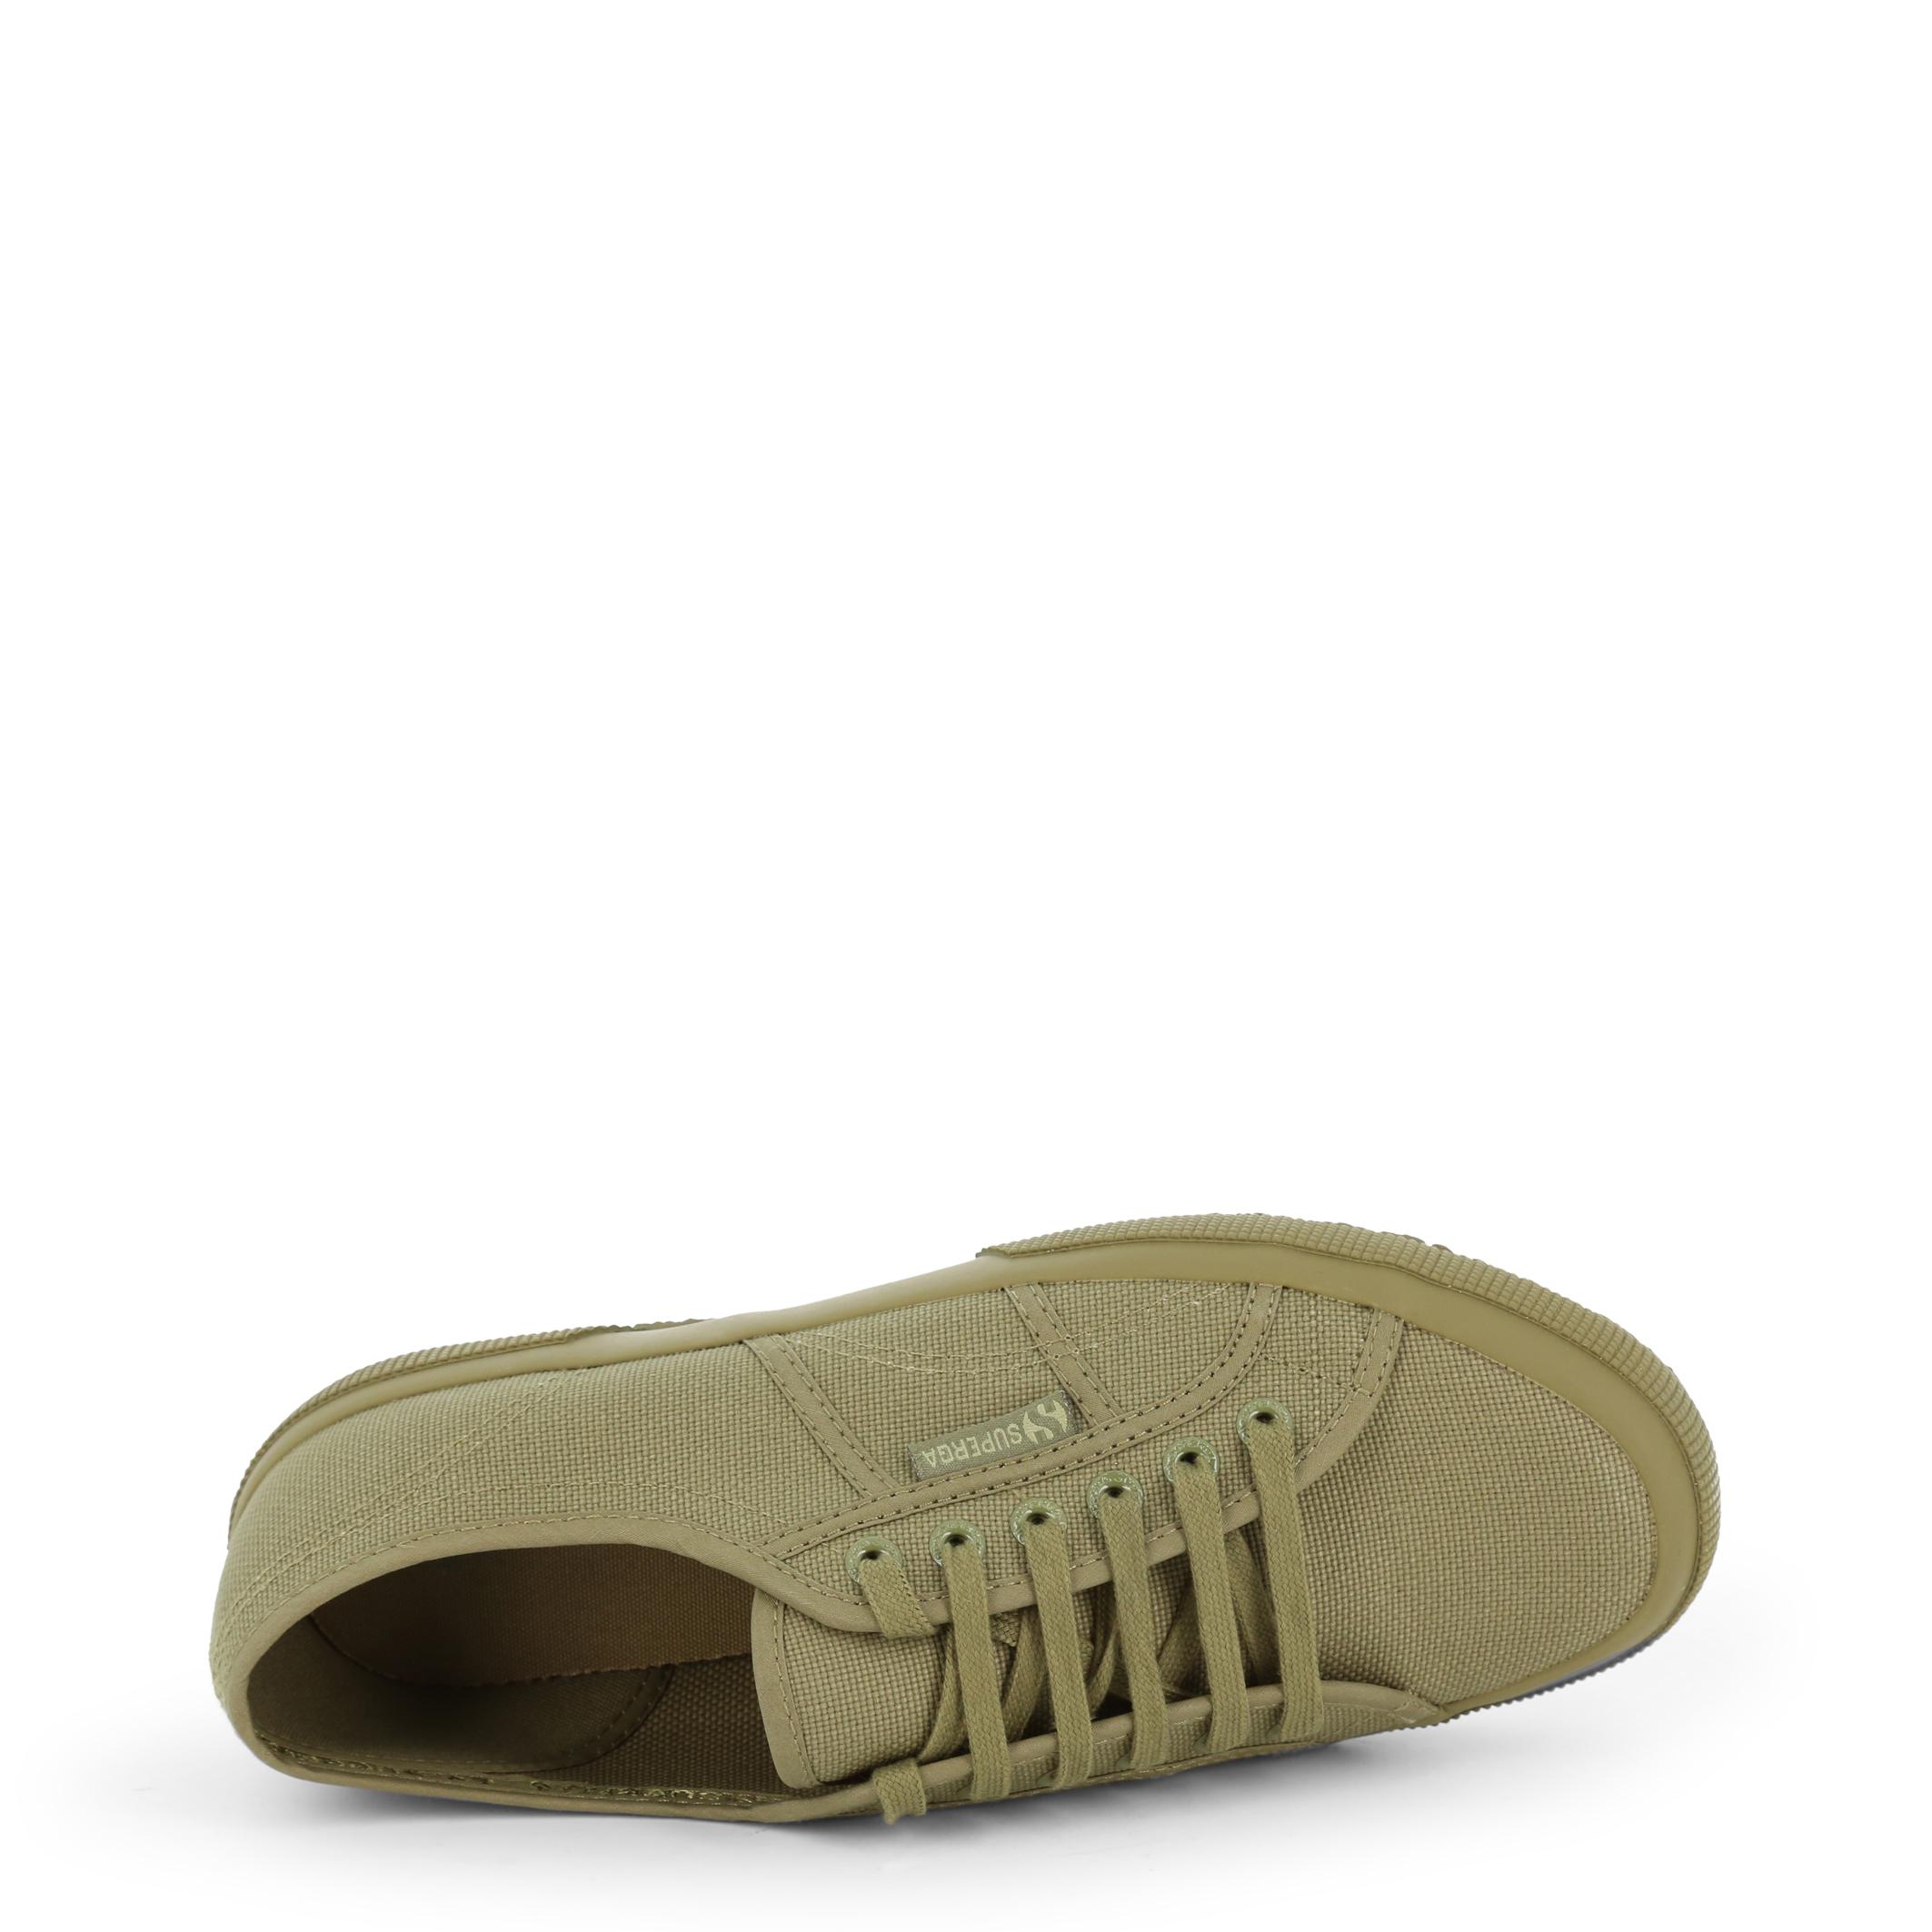 Chaussures de ville  Superga 2750-COTU-CLASSIC green